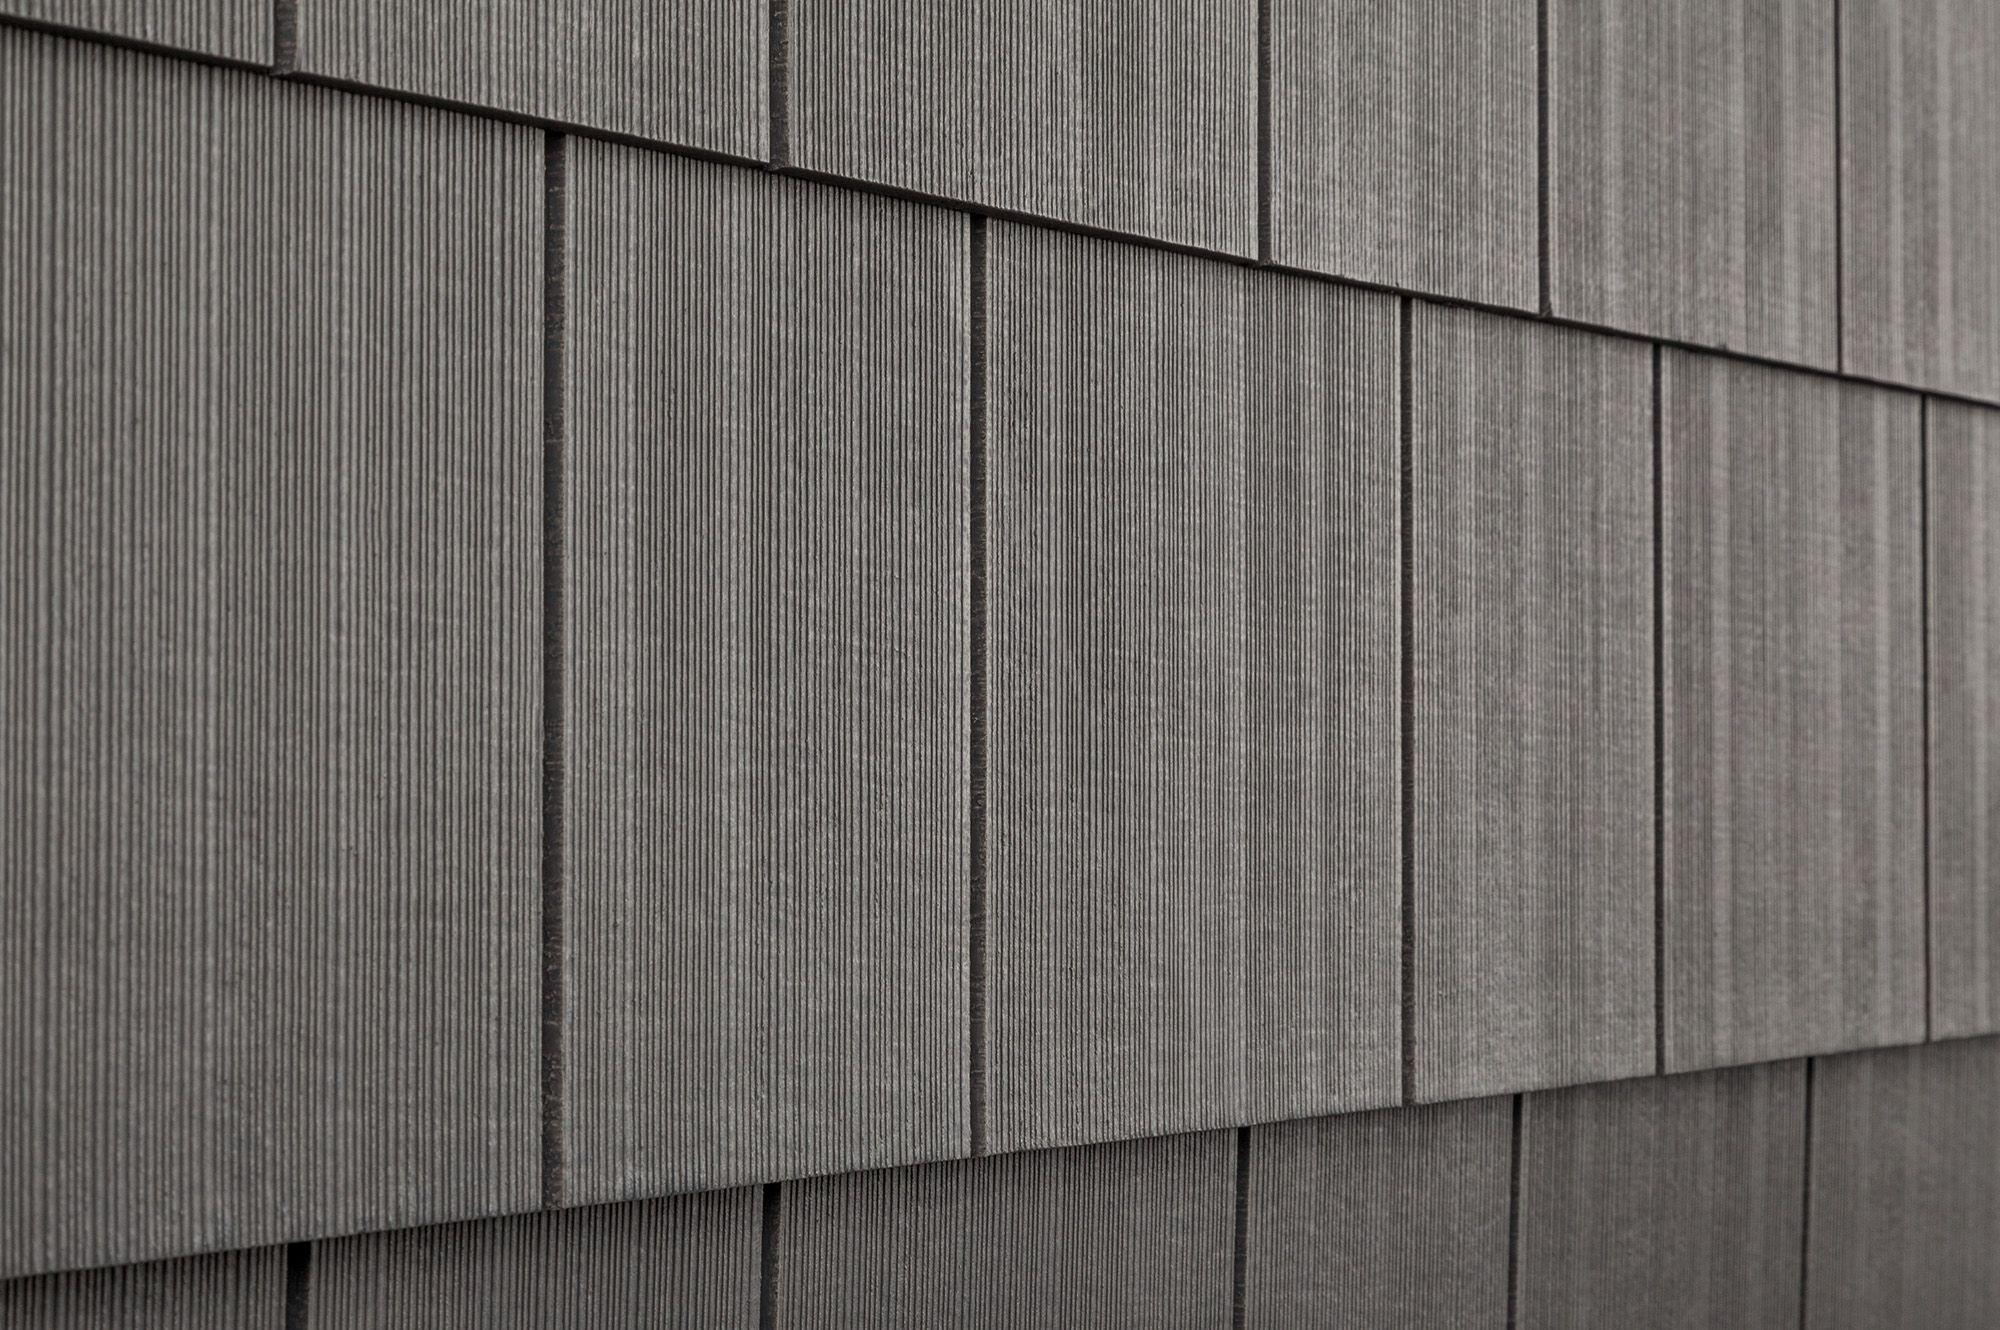 Builddirect 174 Cerber Fiber Cement Siding Rustic Select Shingle Panels Fiber Cement Siding Shingle Panel Fiber Cement